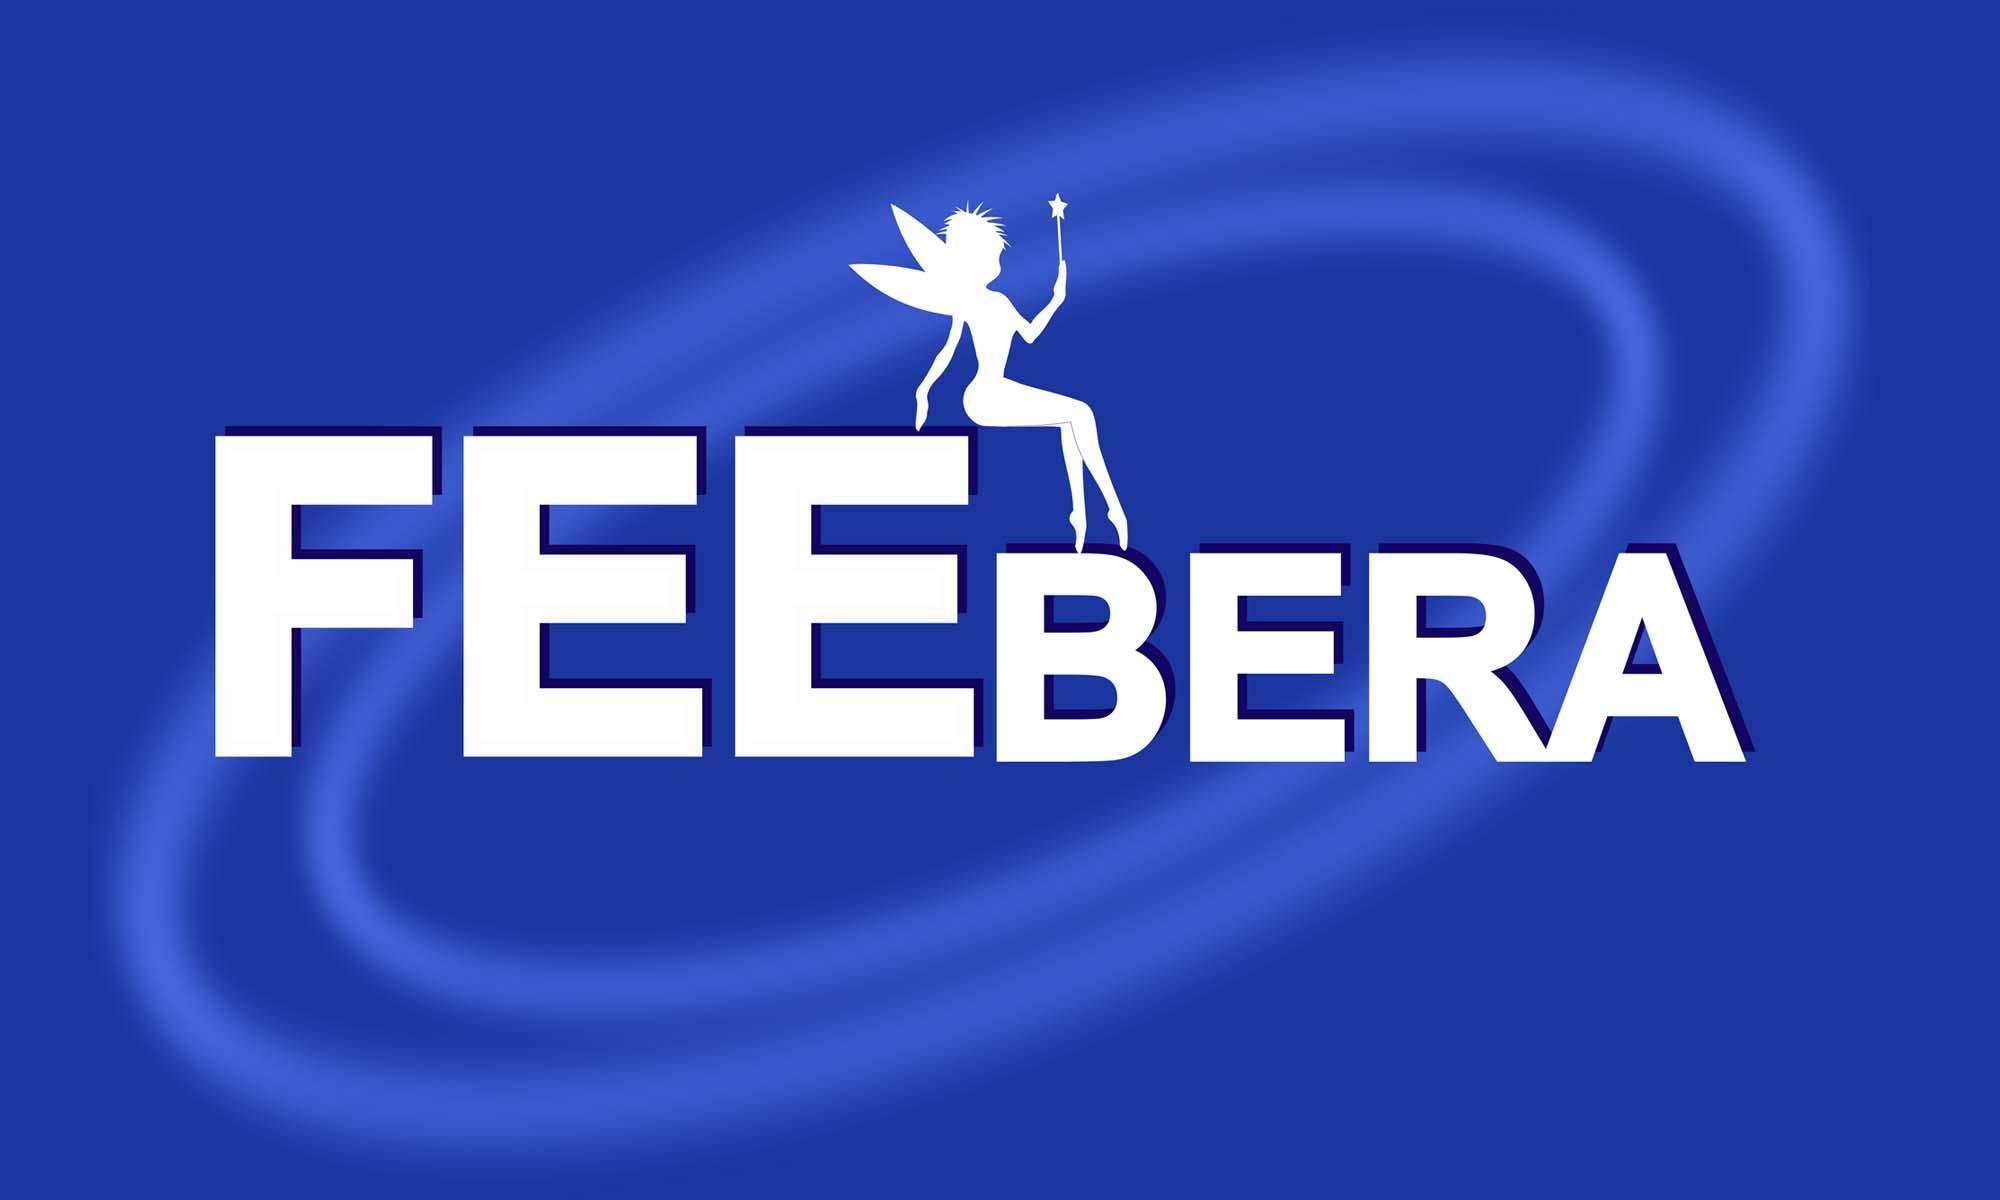 Feebera GbR